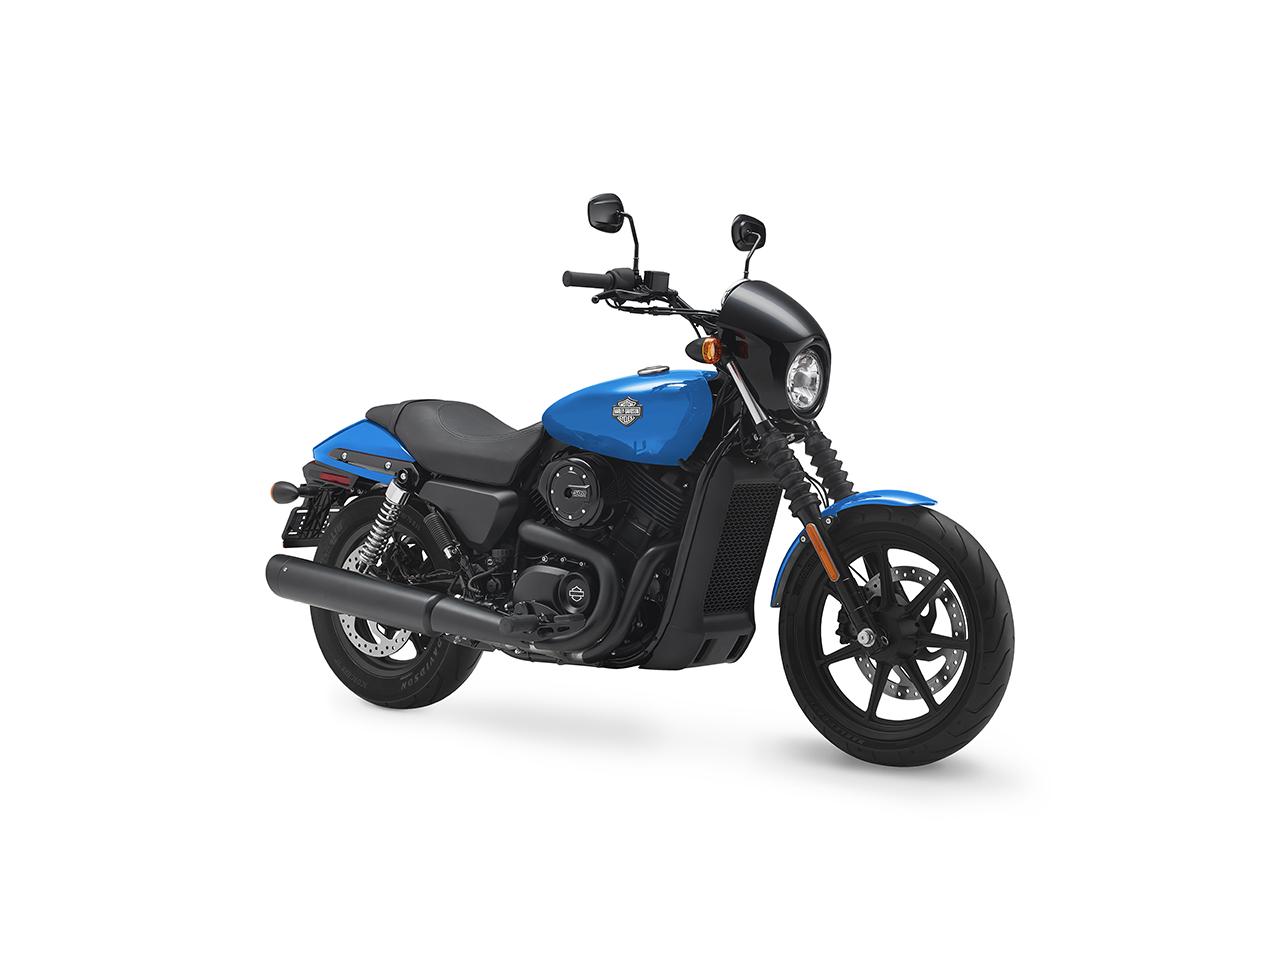 2018 Harley-Davidson Street 500 Image